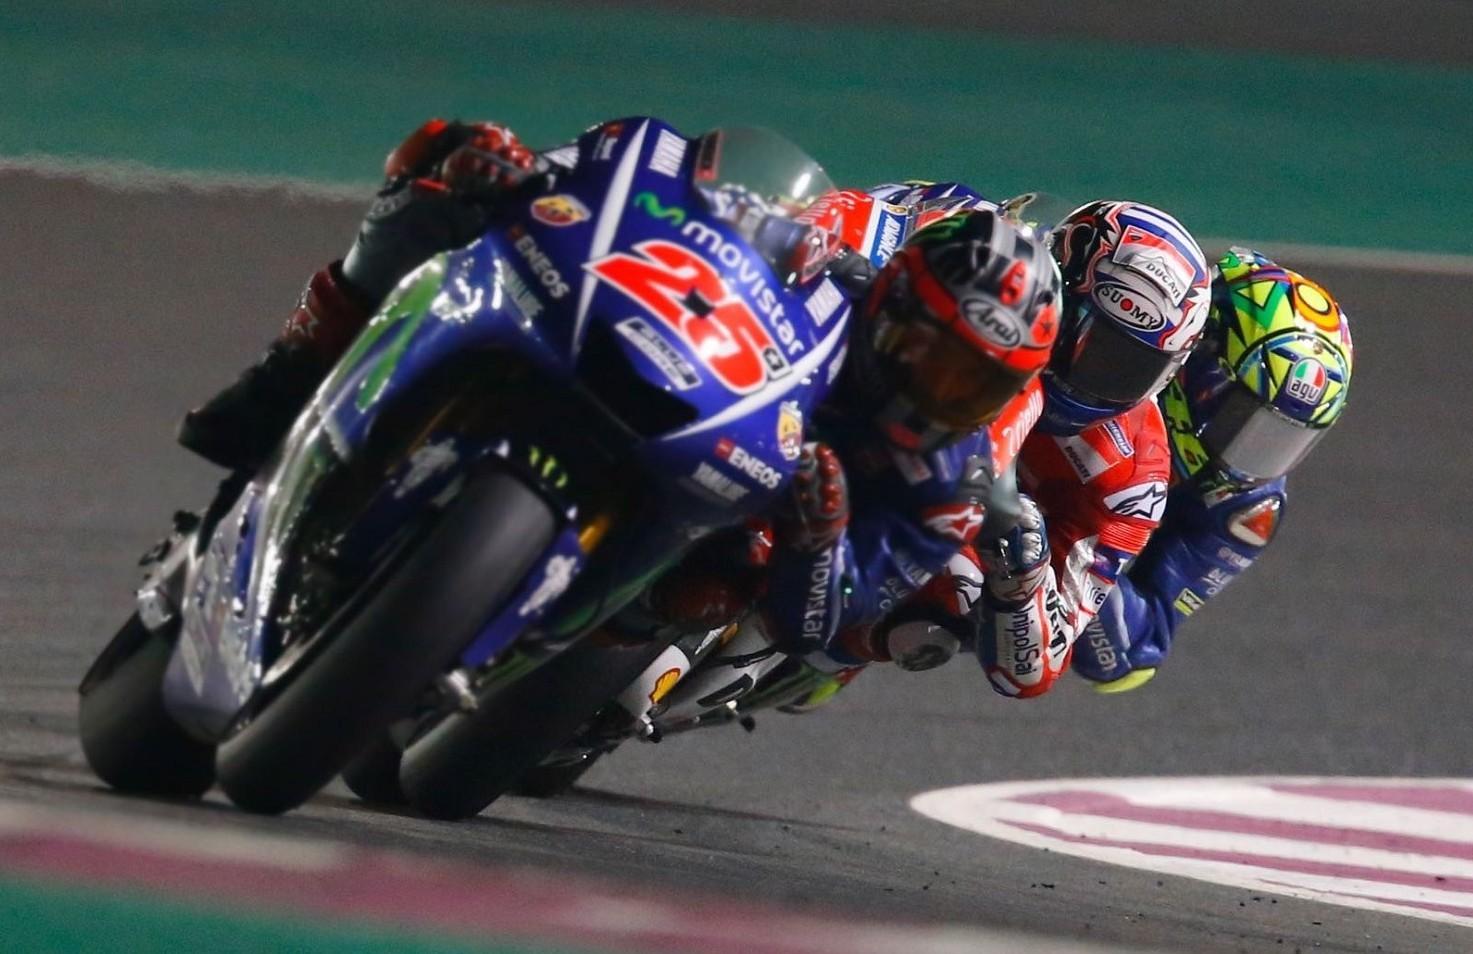 MotoGP streaming Gran Bretagna oggi su s